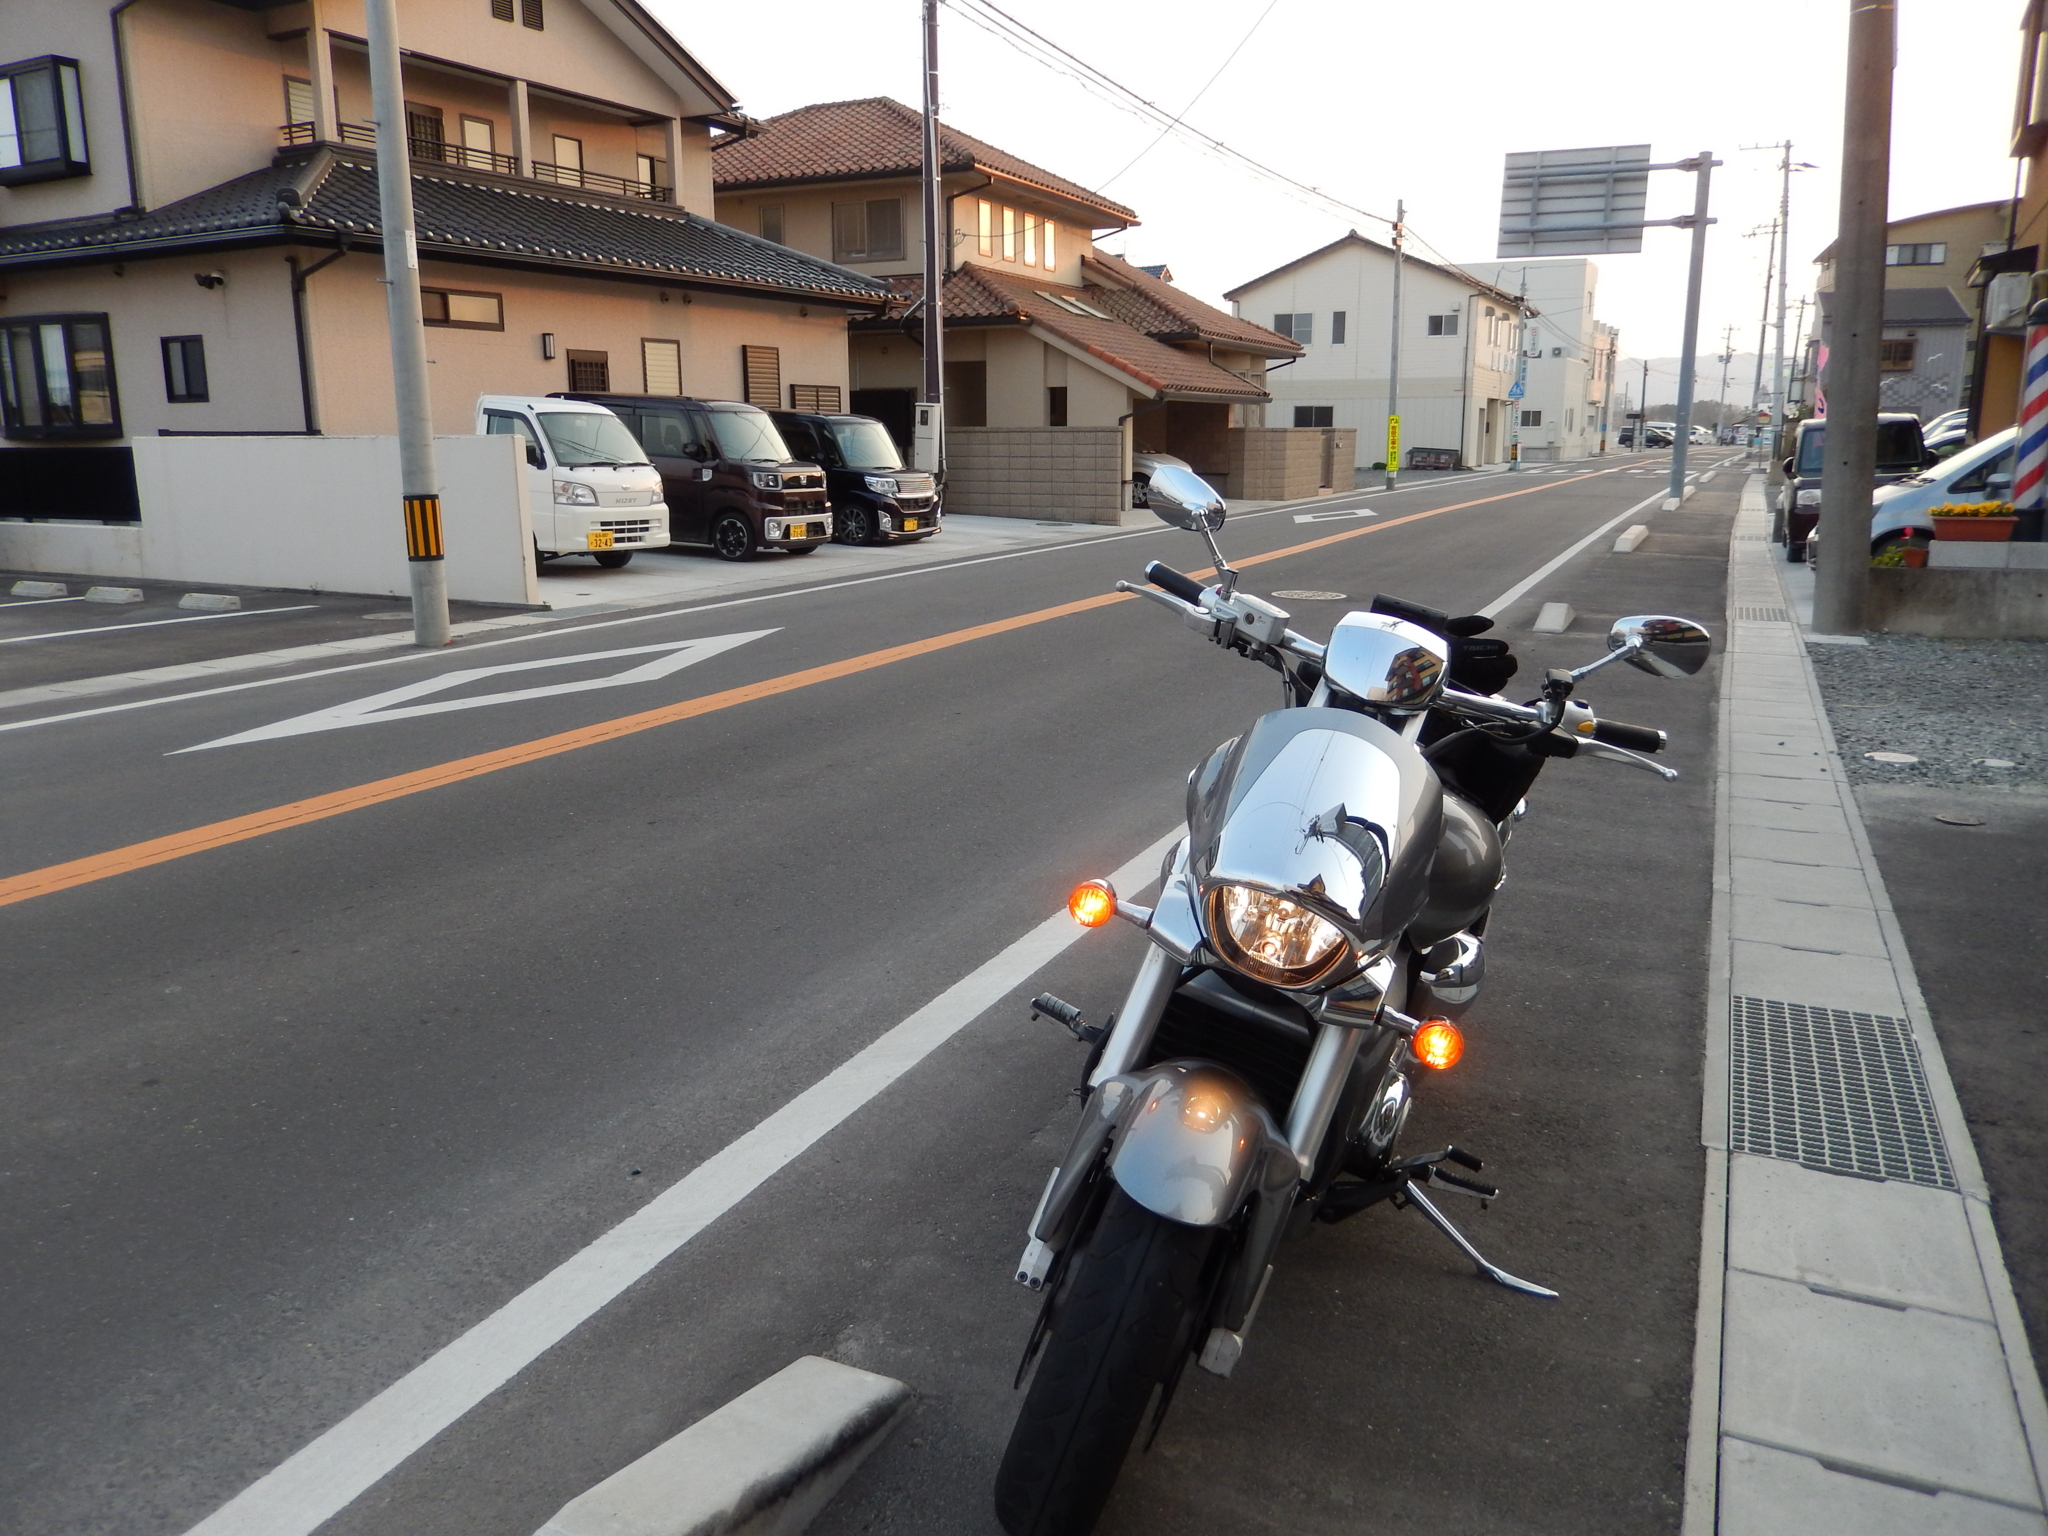 f:id:ToshUeno:20160416173818j:plain